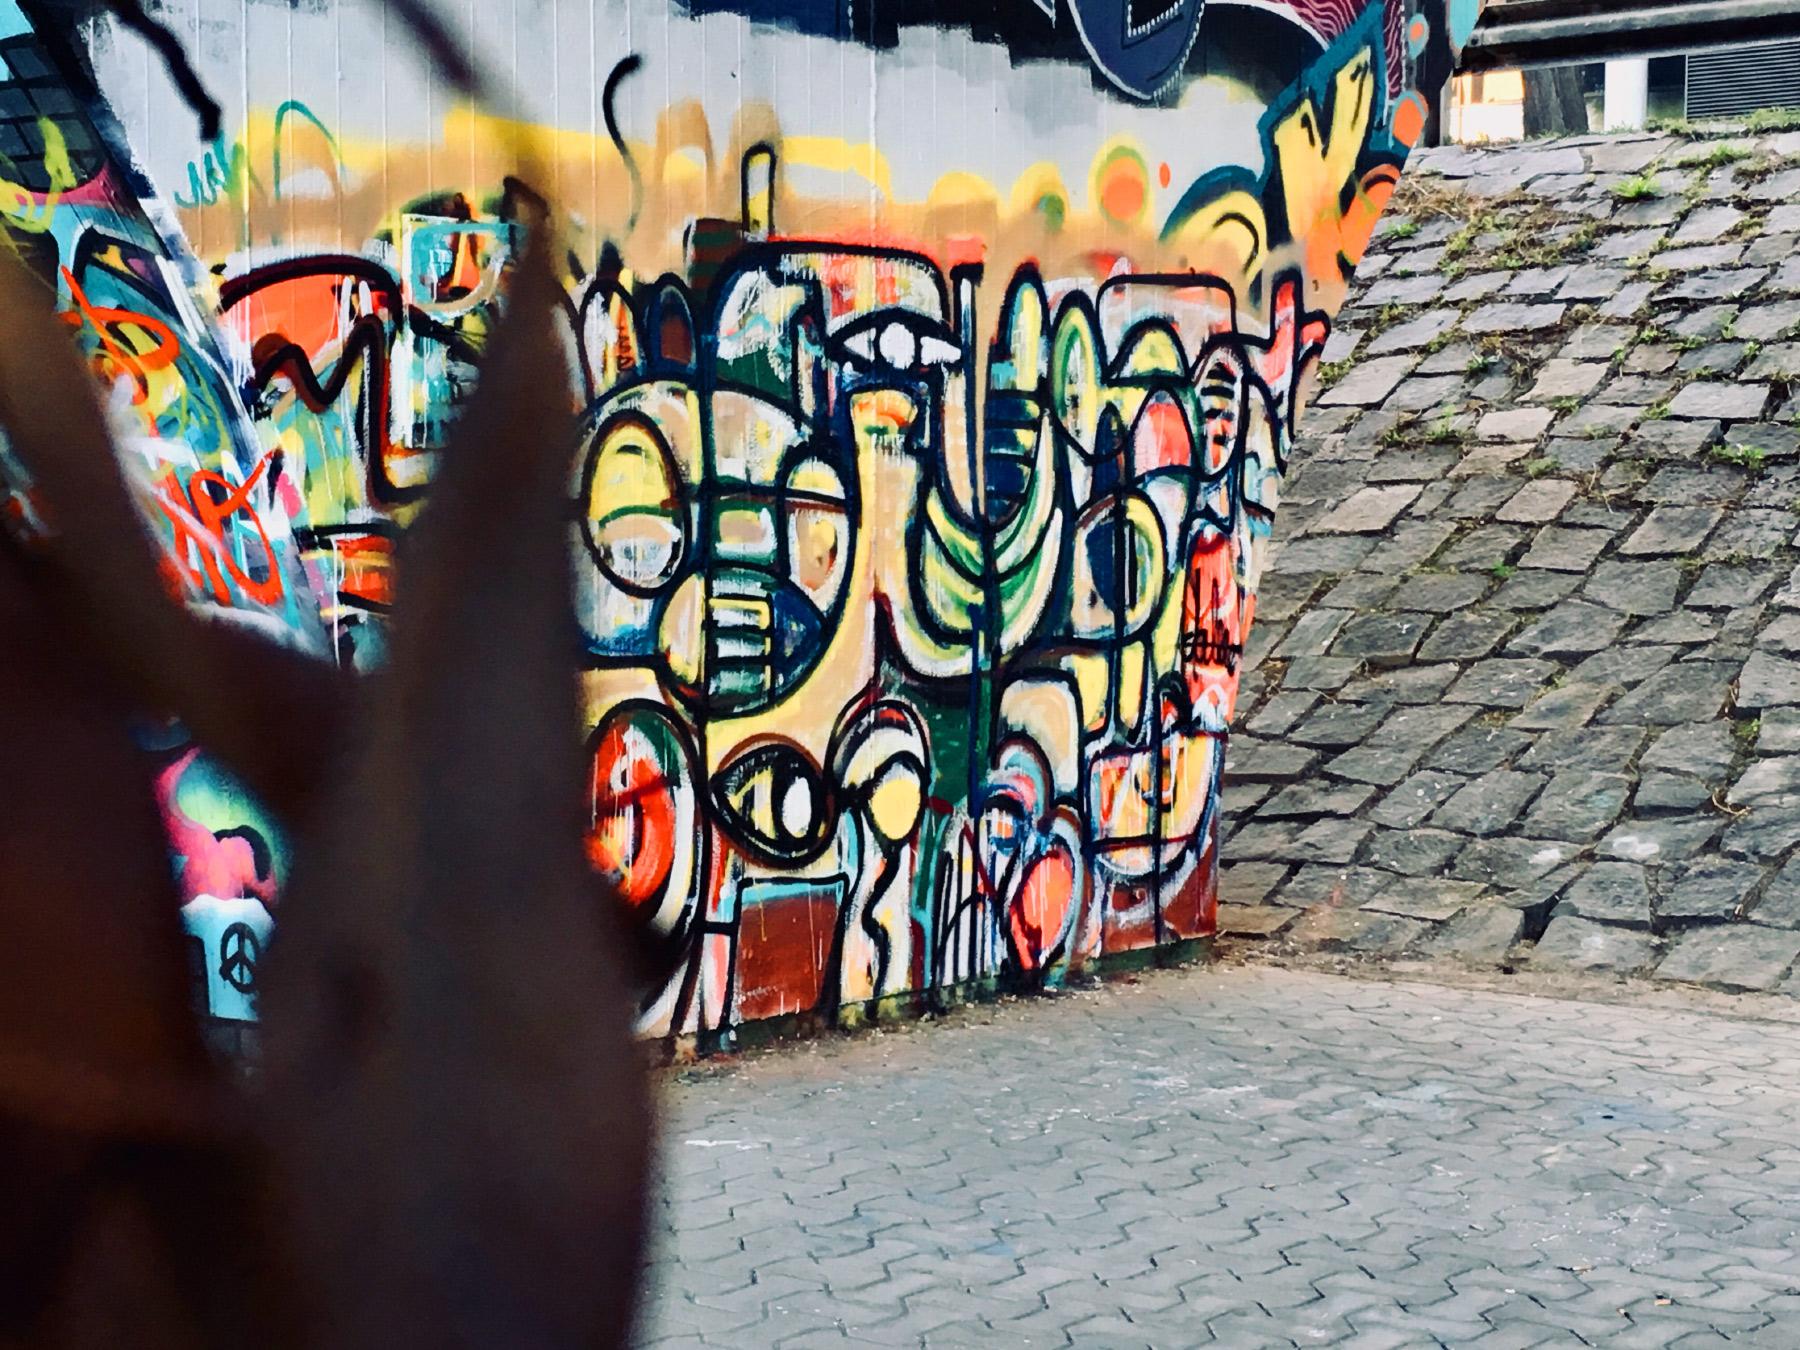 Rob_Adalierd_Painting_Vienna_Abstract_Contemporary_Street_art_9.jpg